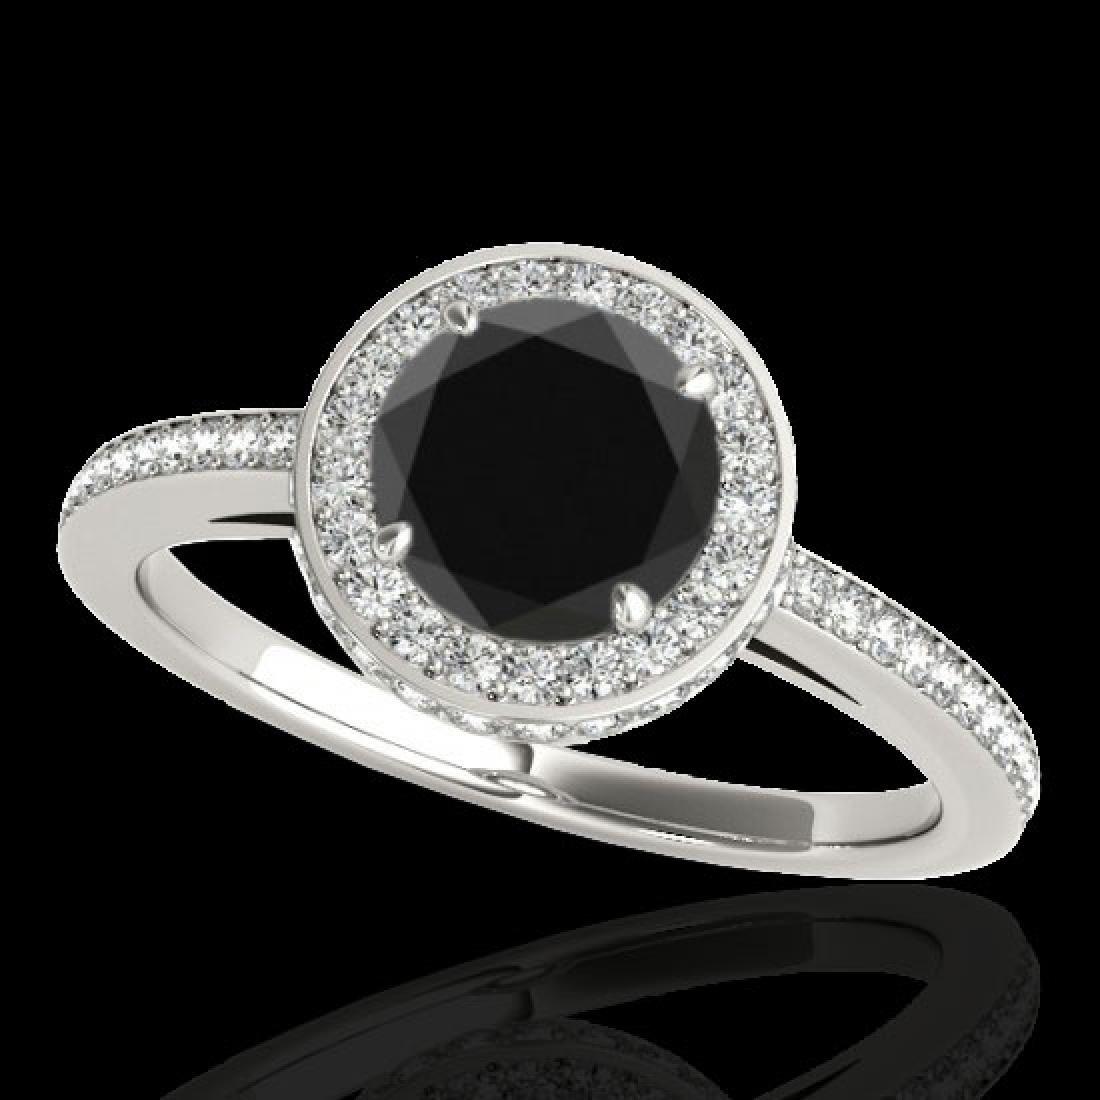 1.55 CTW Certified VS Black Diamond Solitaire Halo Ring